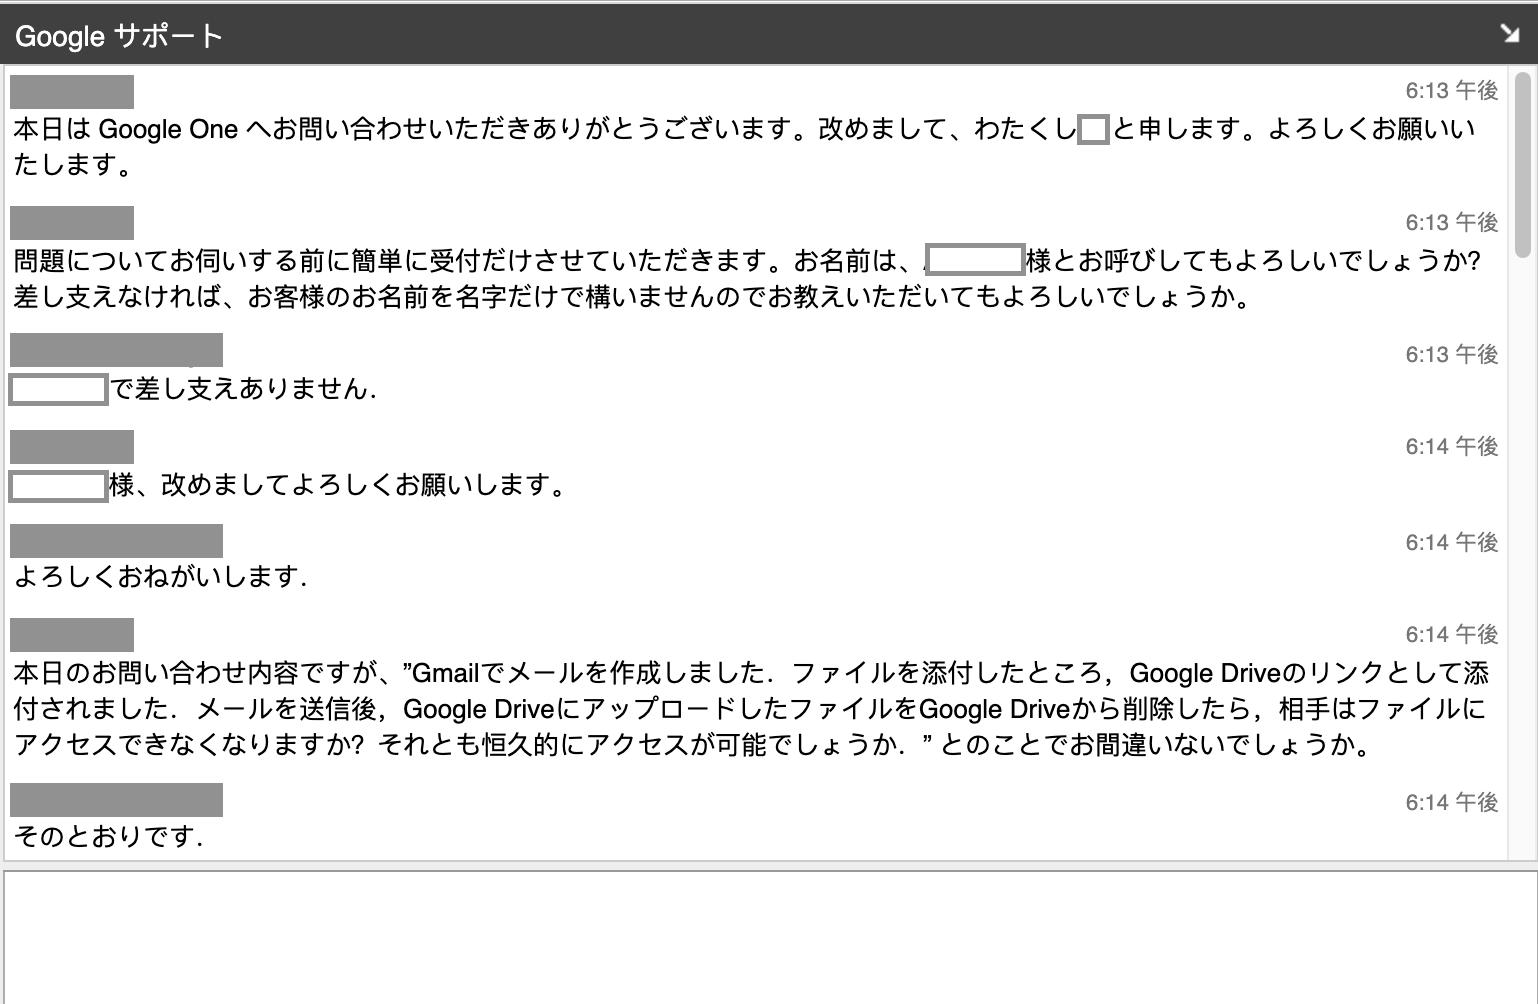 f:id:atsuhiro-me:20200220183431p:plain